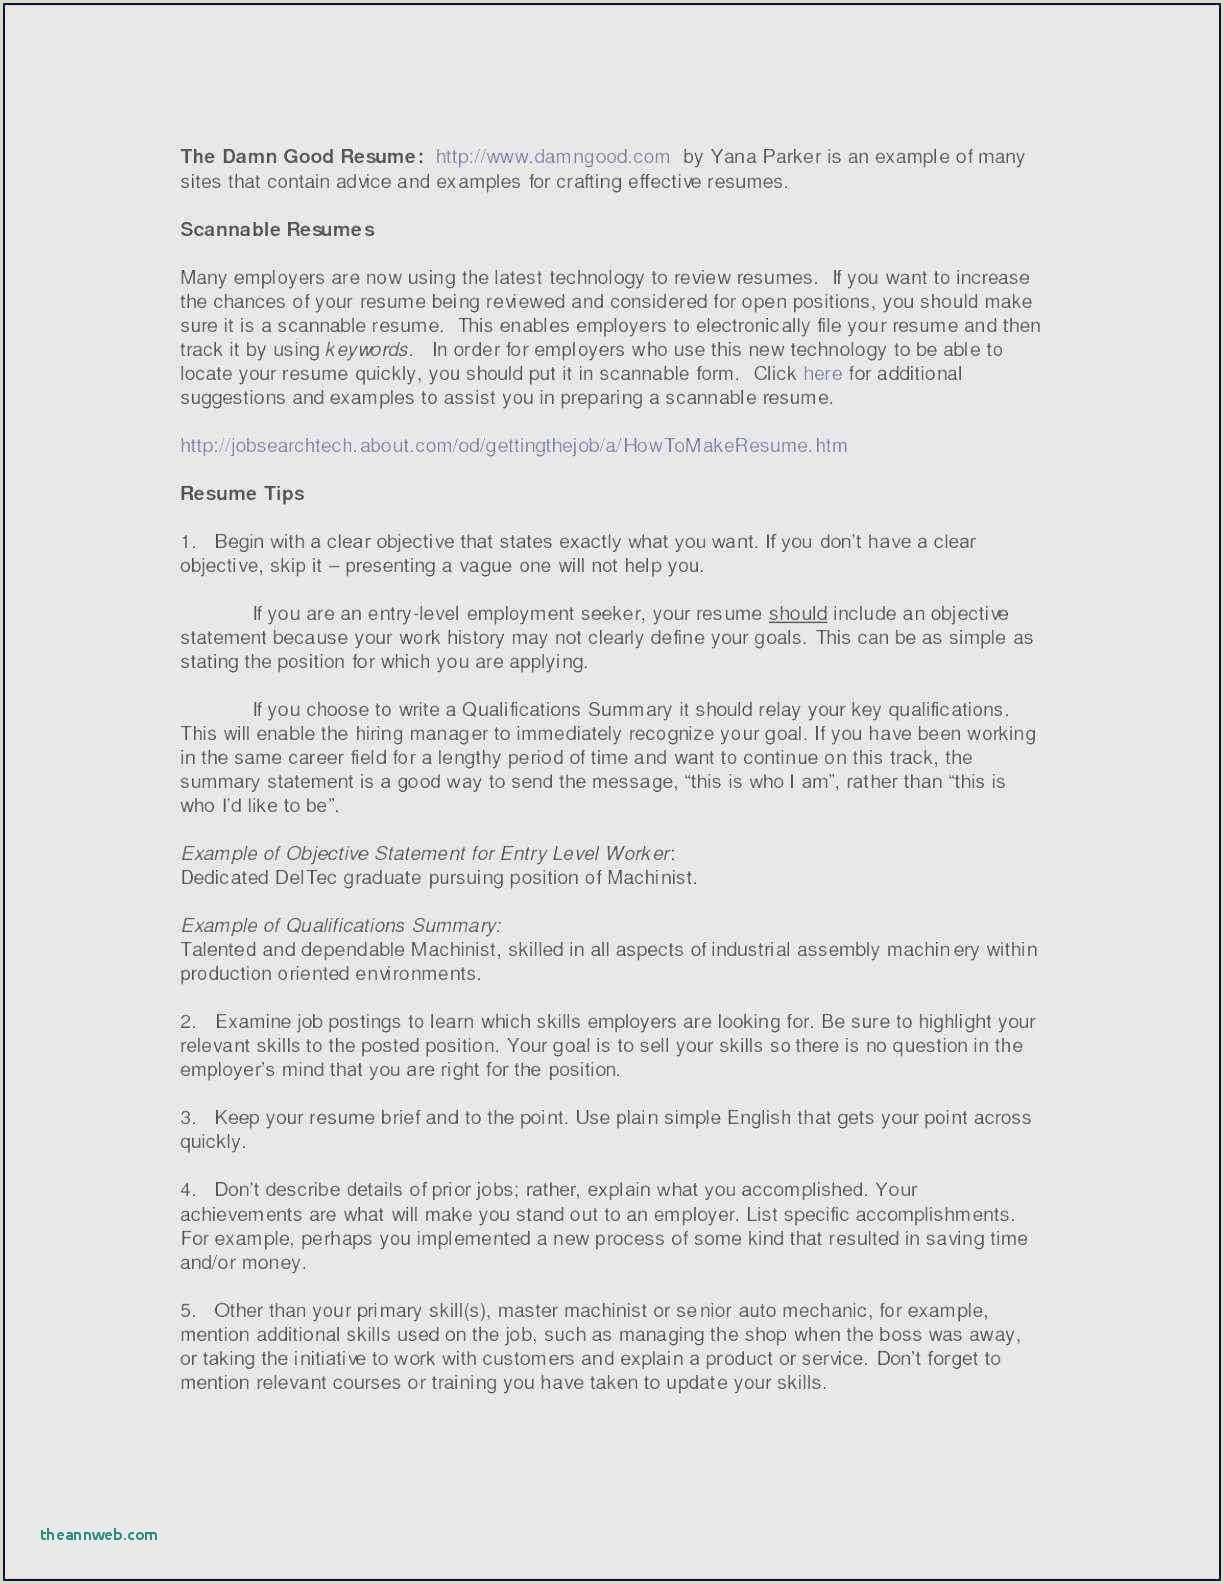 Resume Portfolio Examples Dental Hygienist Resume Template